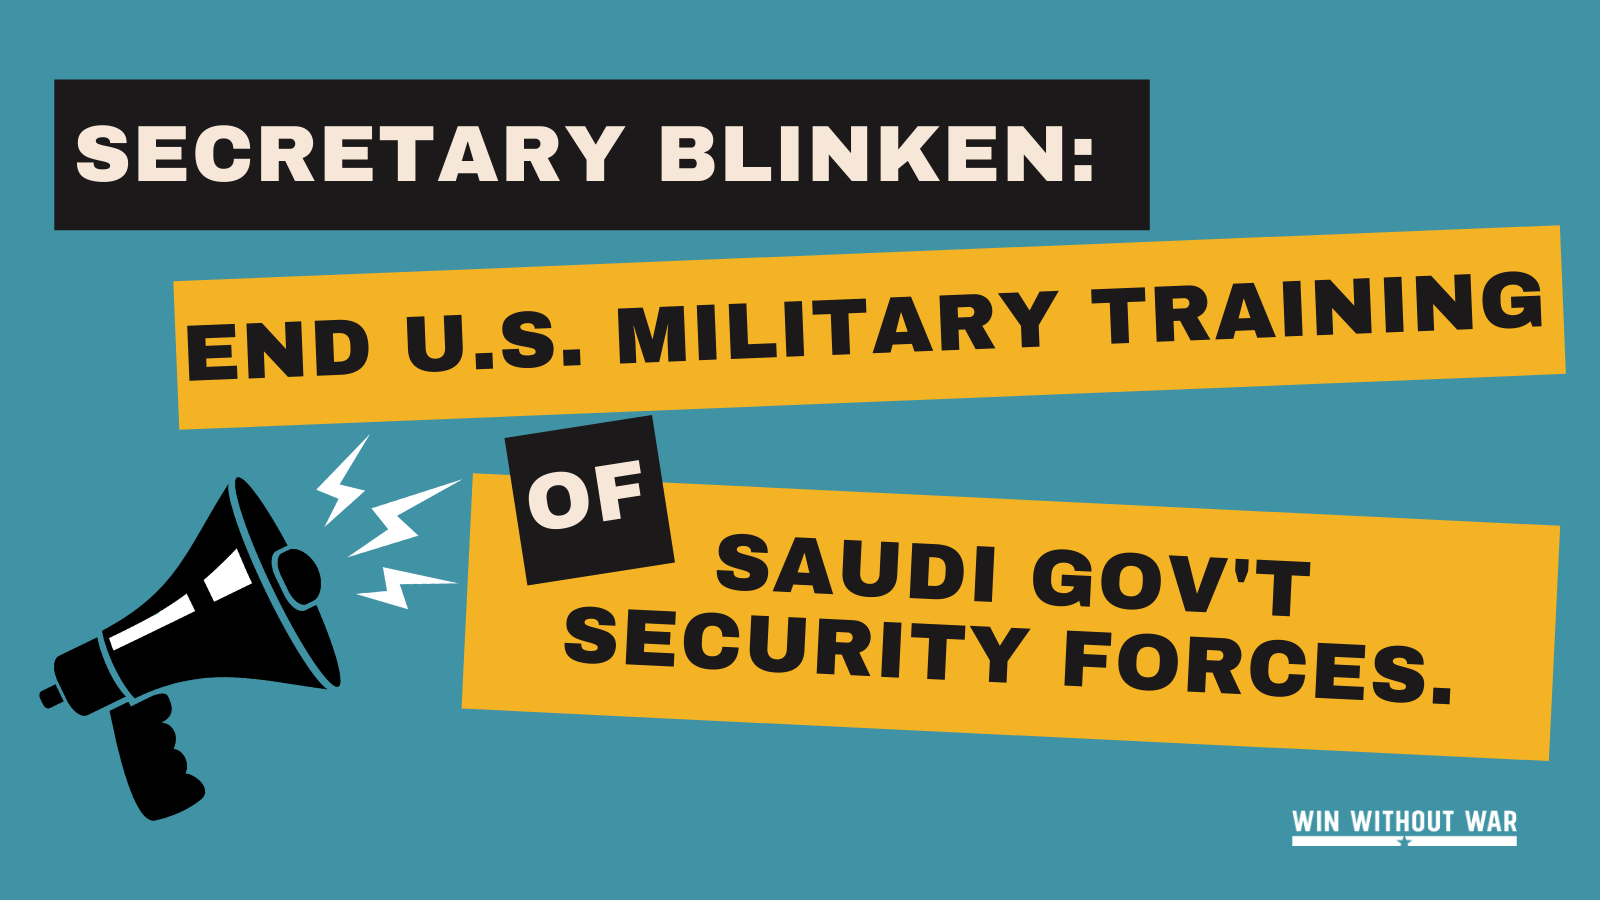 Secretary Blinken: Halt ALL military training of Saudi government security forces